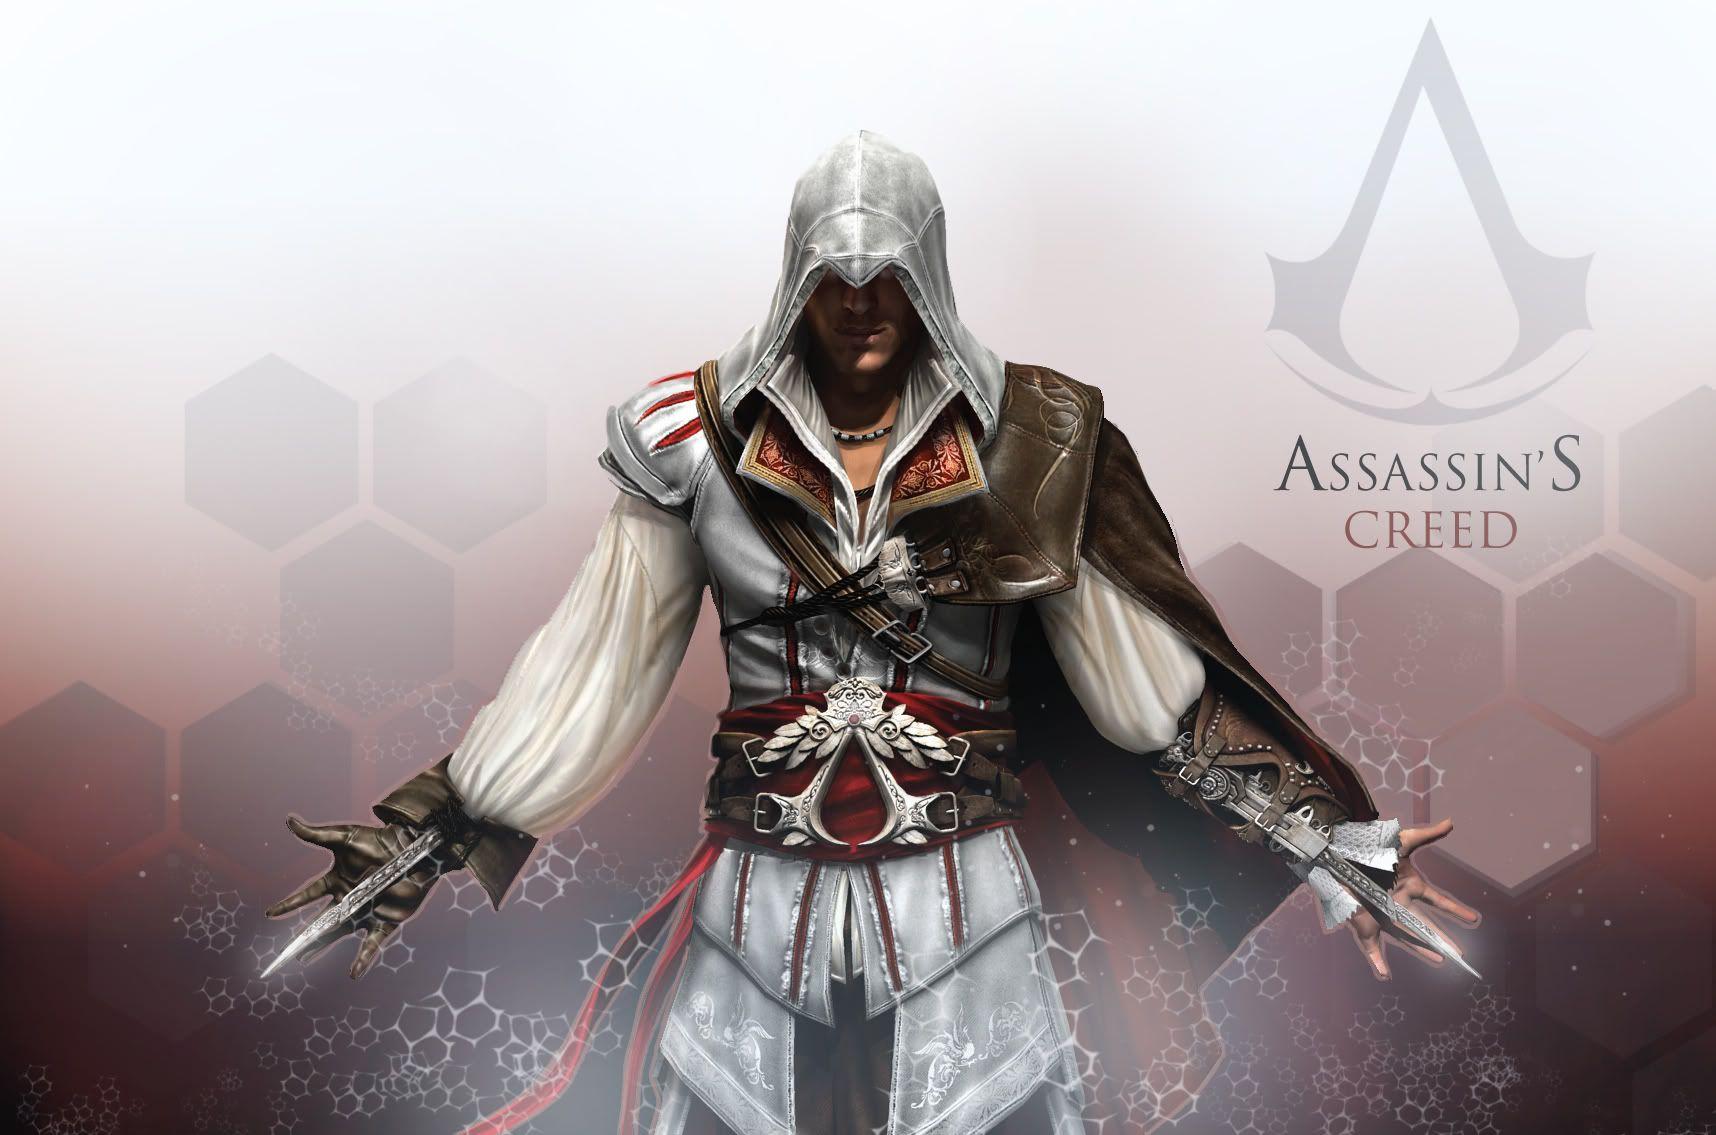 Assassins Creed Honra El Credo Nada Es Verdad Todo Está Permitido Assassinscreed Todosuni Assassins Creed Assassins Creed Ii Assassin S Creed Wallpaper